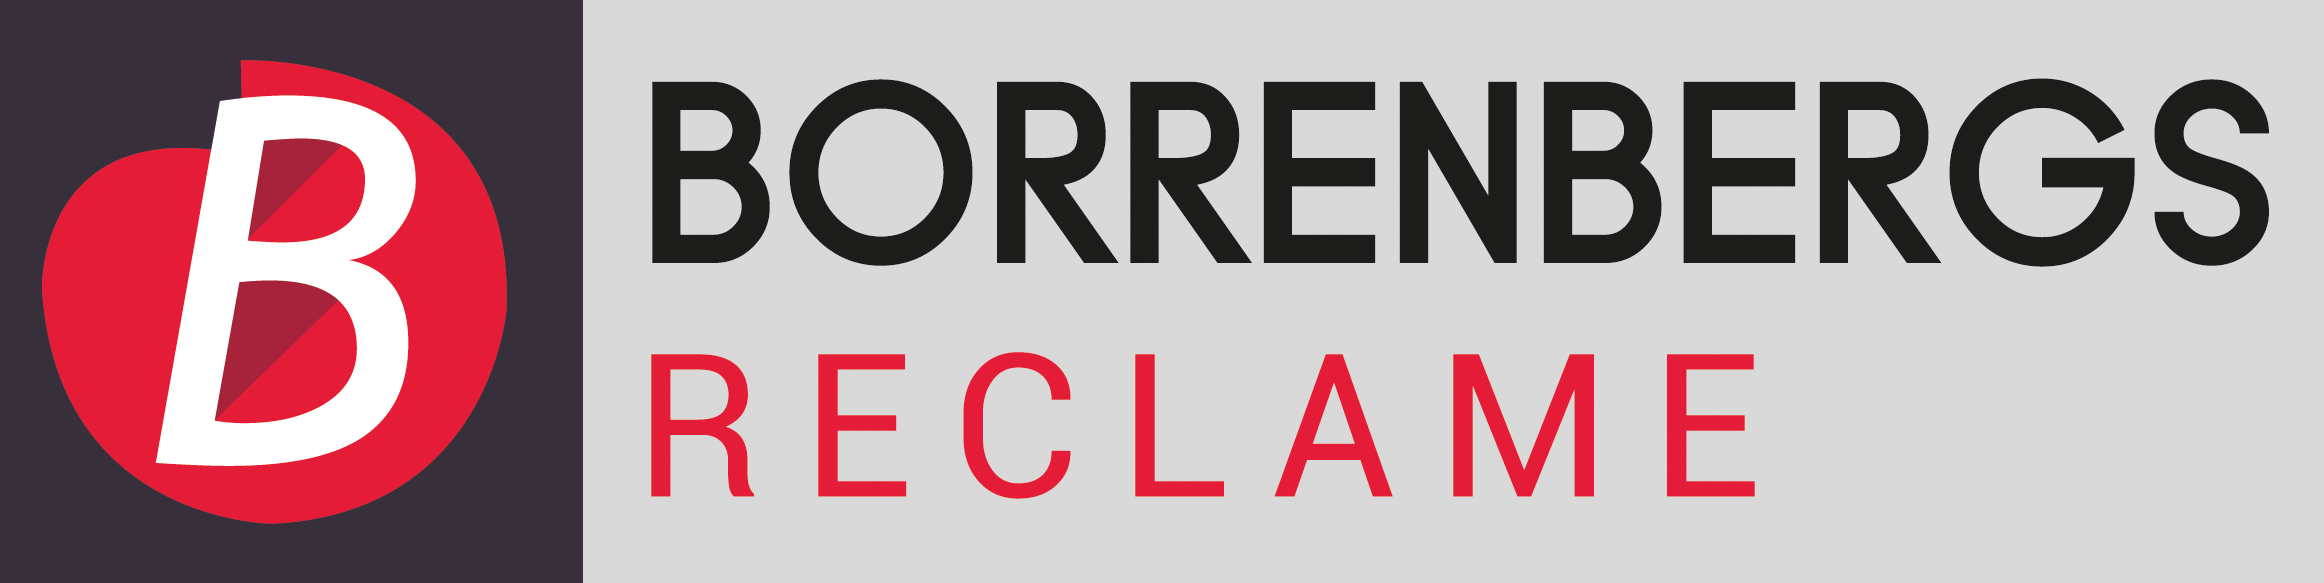 Borrenbergs Reclame